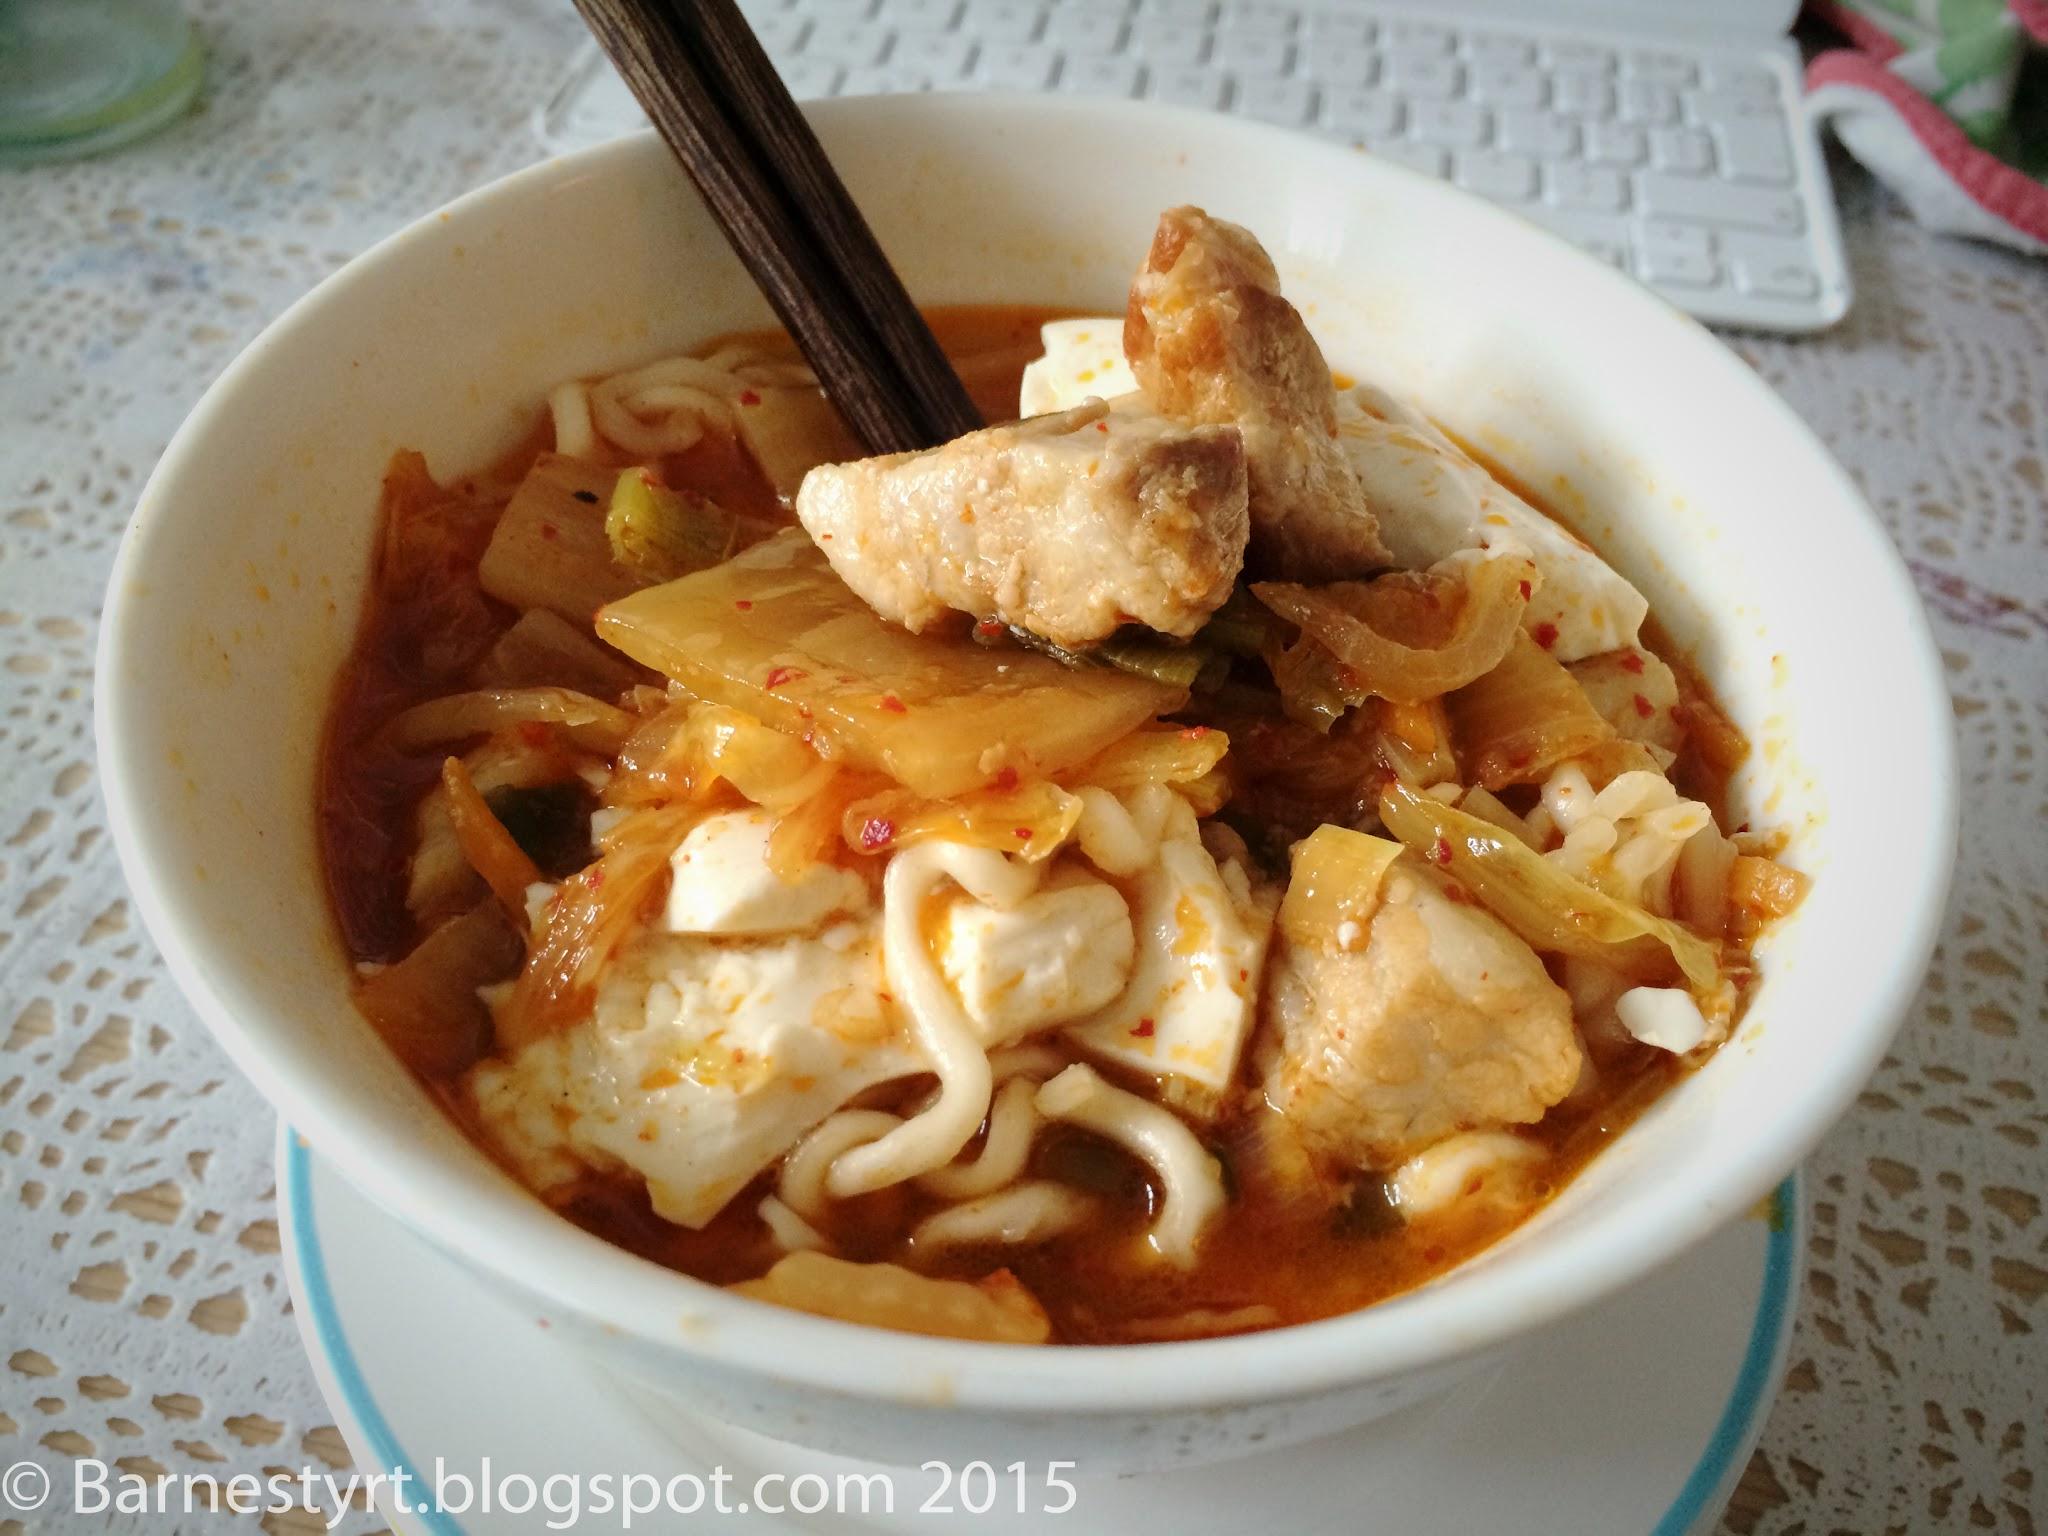 Kimchi jjigae with noodles